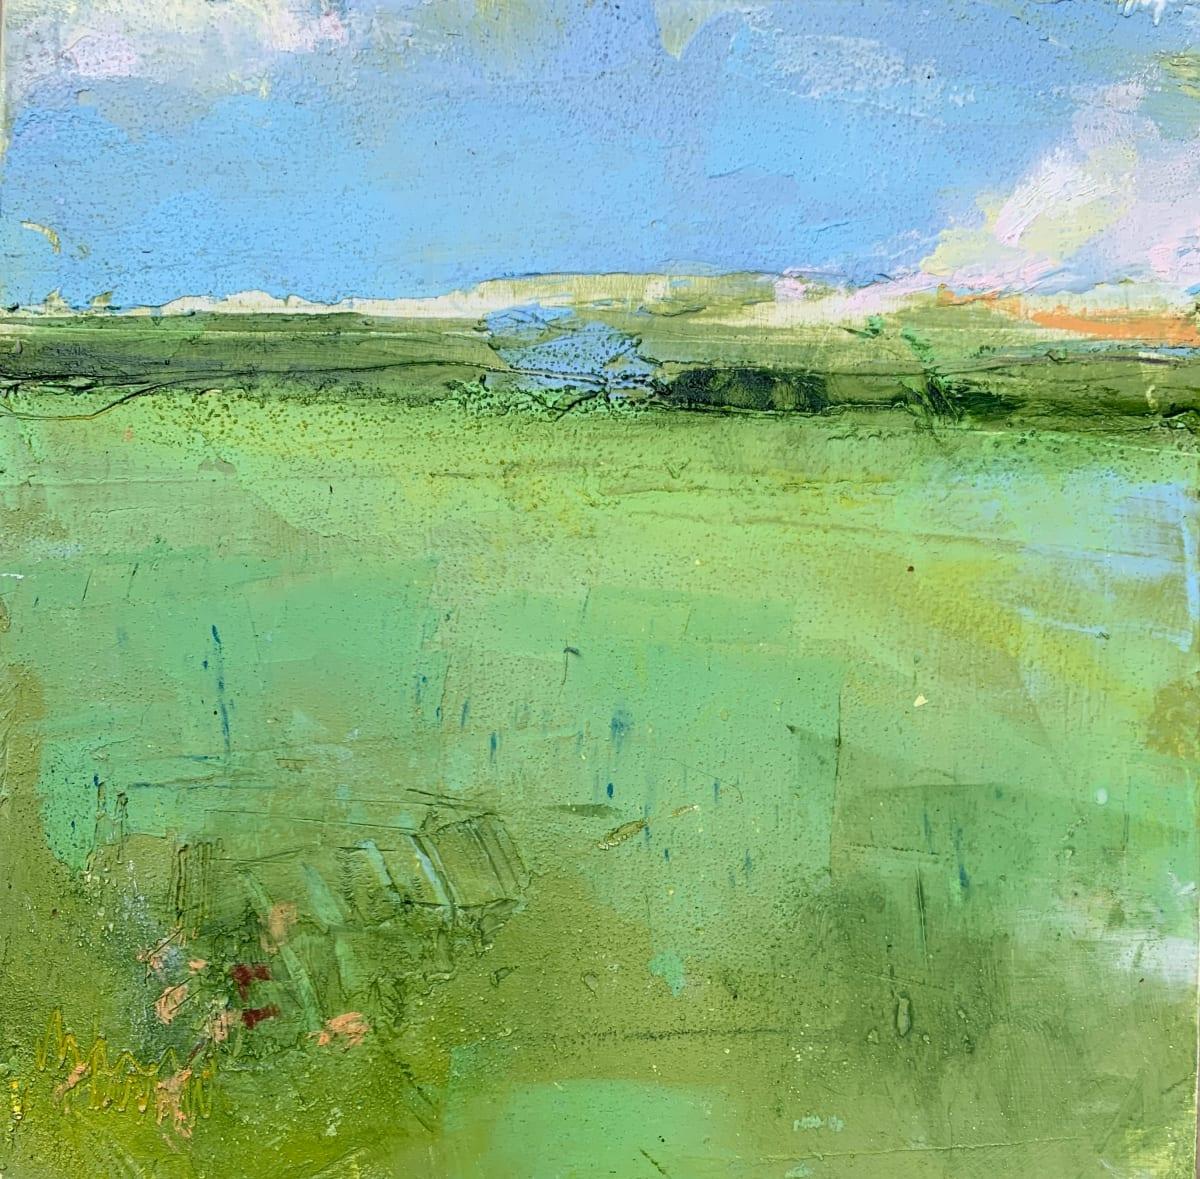 Little Landscape #4 by Sally Hootnick